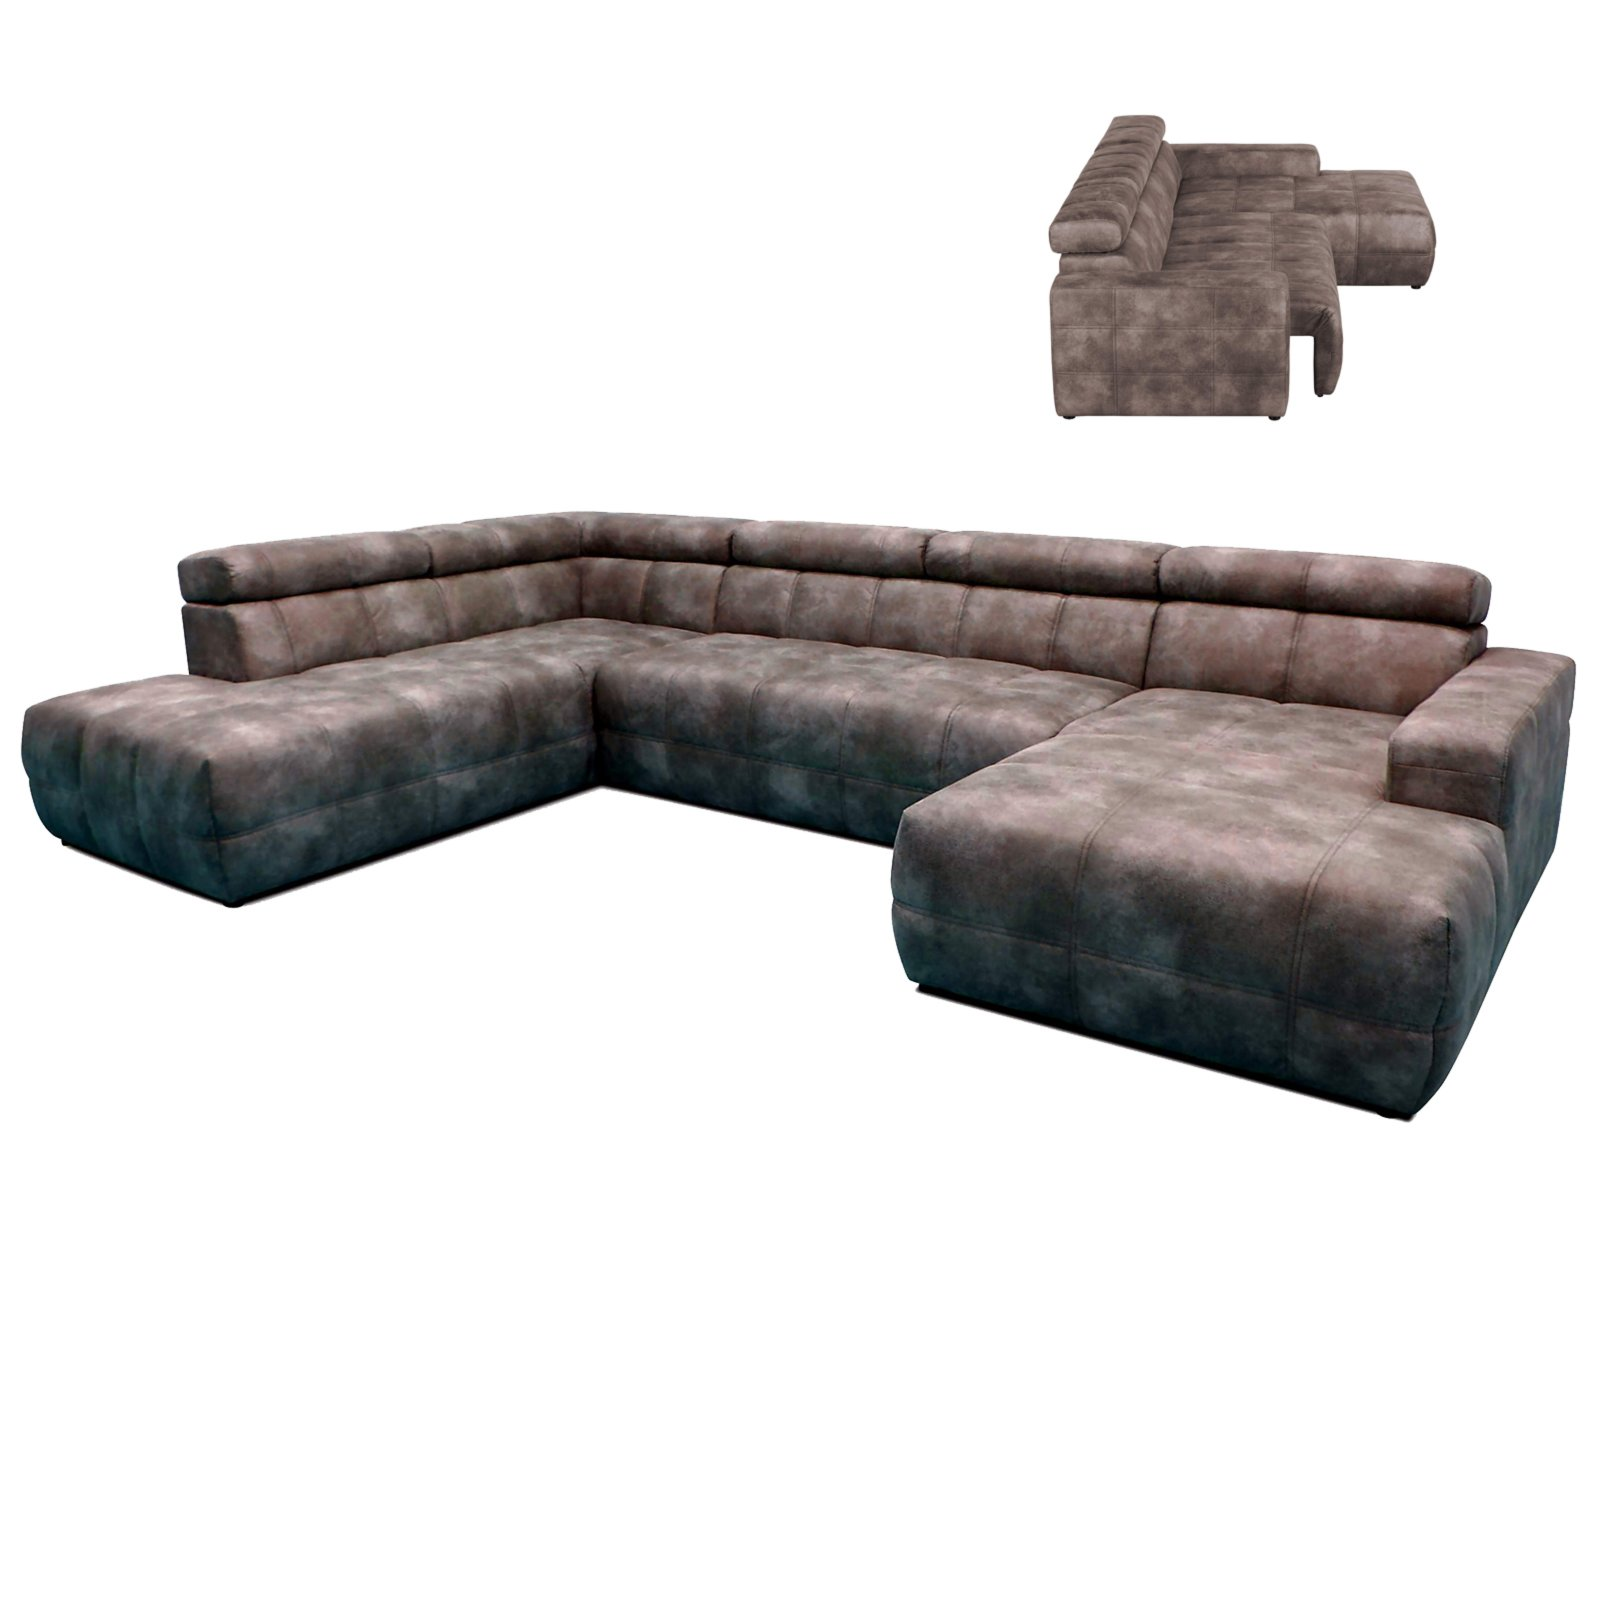 Wohnlandschaft - grau - ausziehbarer Sitz - Recamiere rechts ...